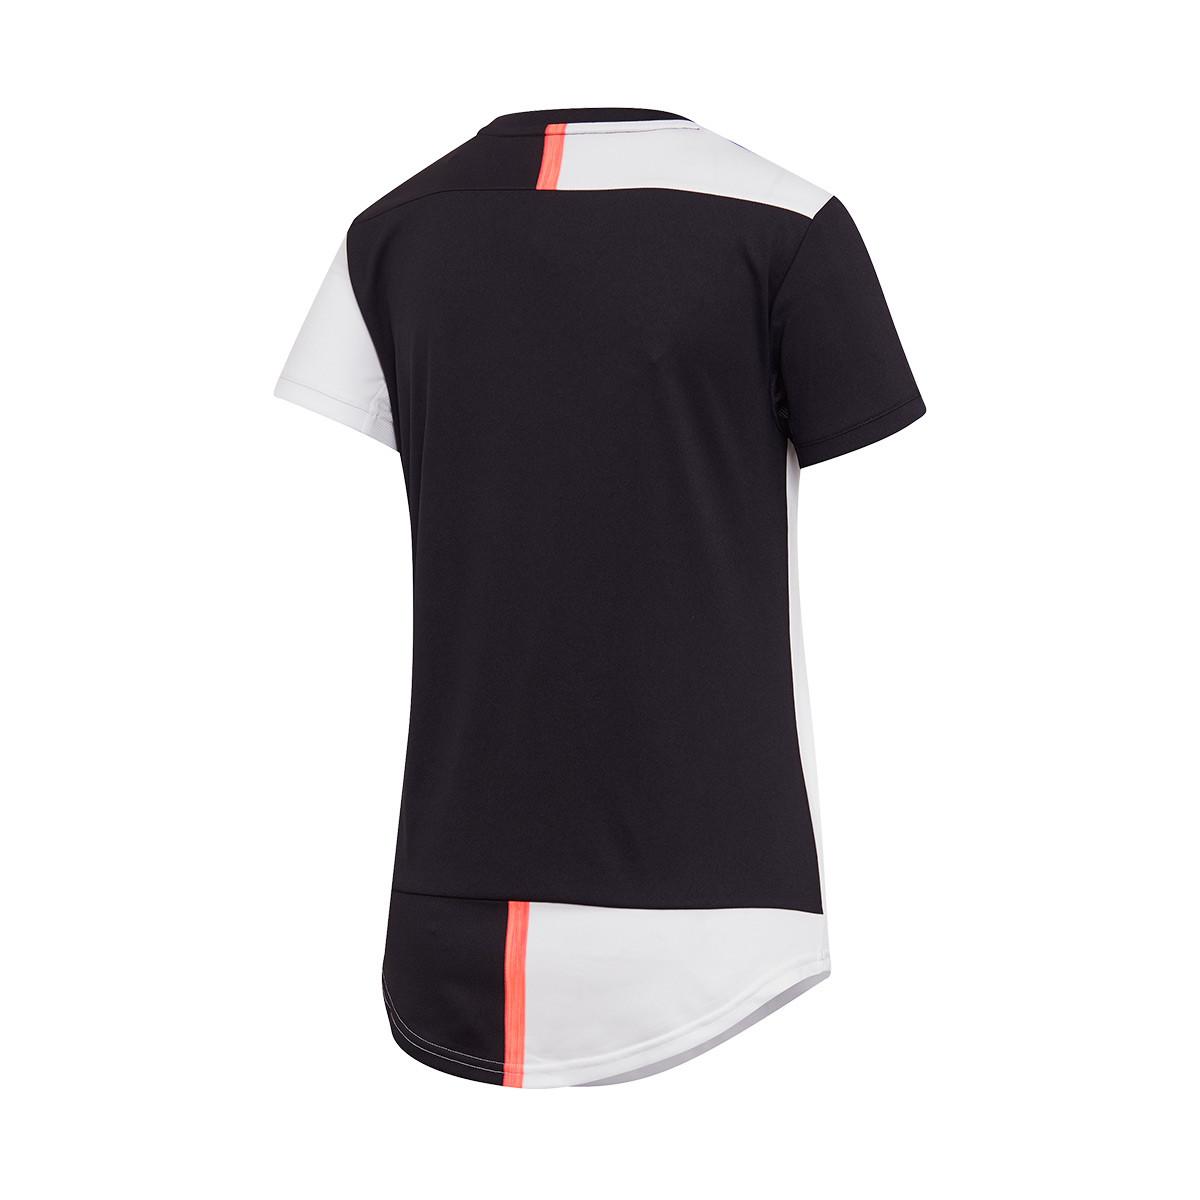 wholesale dealer f2ead eac27 Camiseta Juventus Primera Equipación 2019-2020 Mujer Black-White